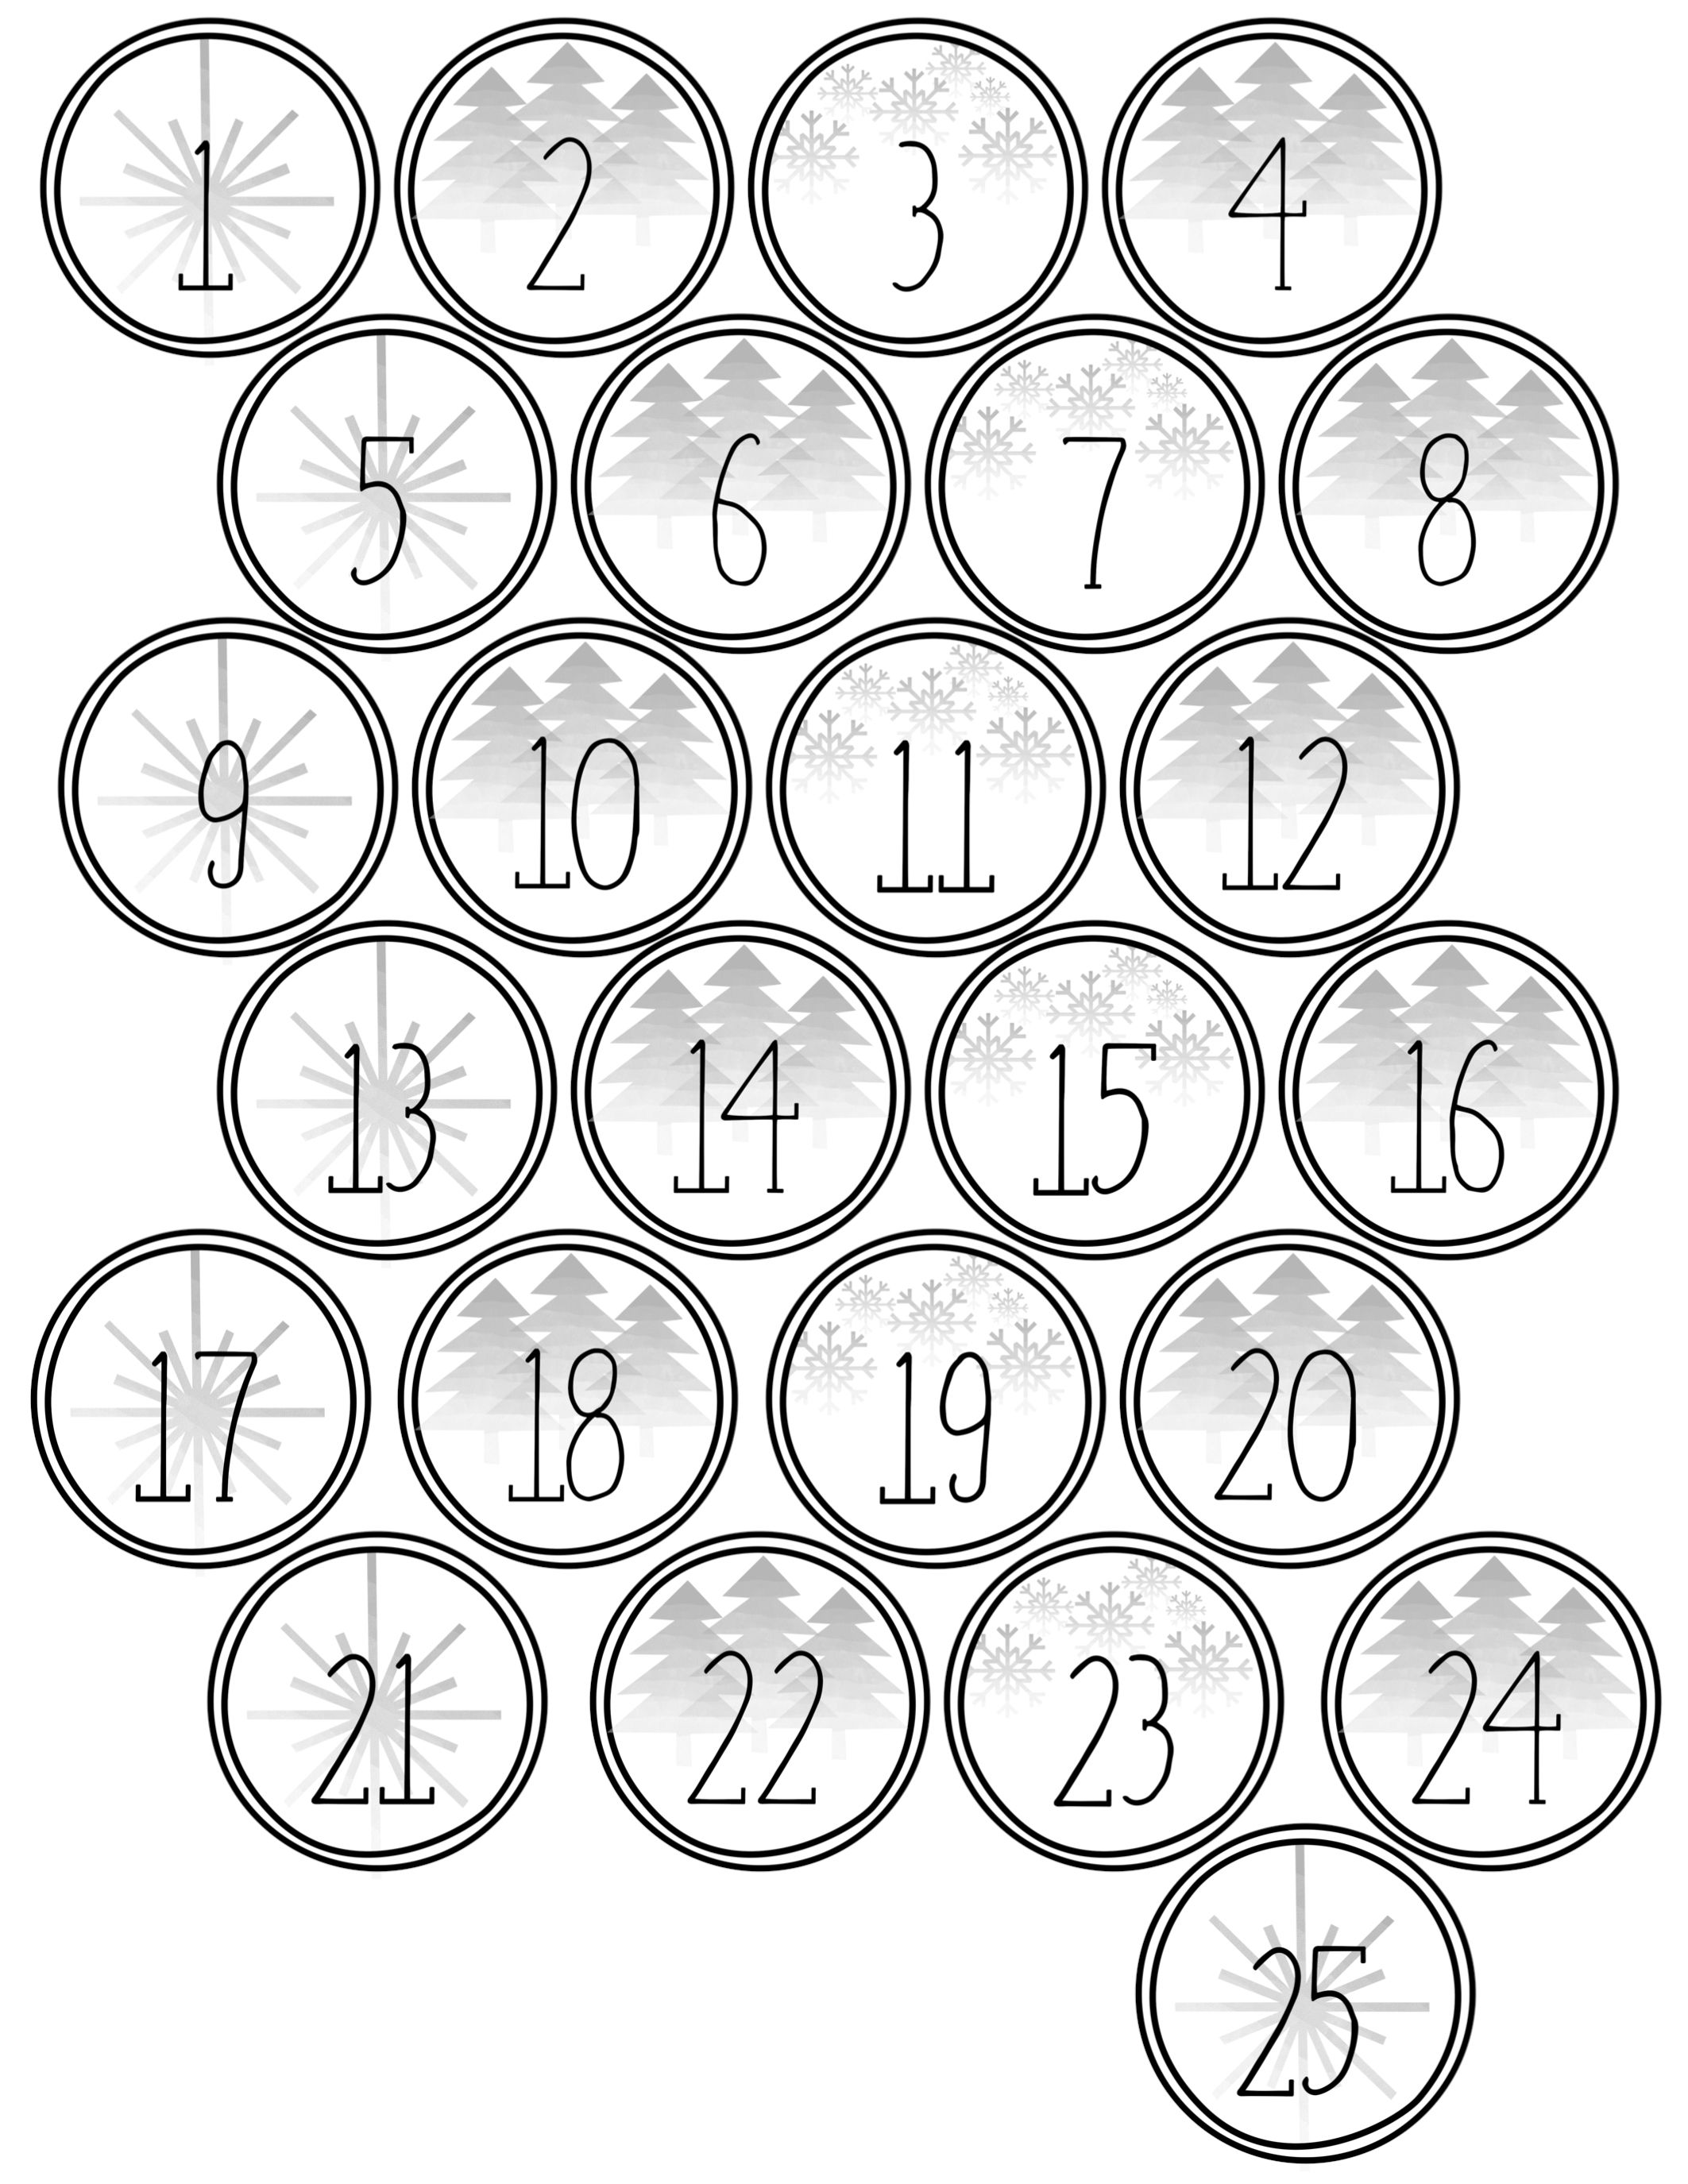 Pin By Liz Turek On Advent Ideas